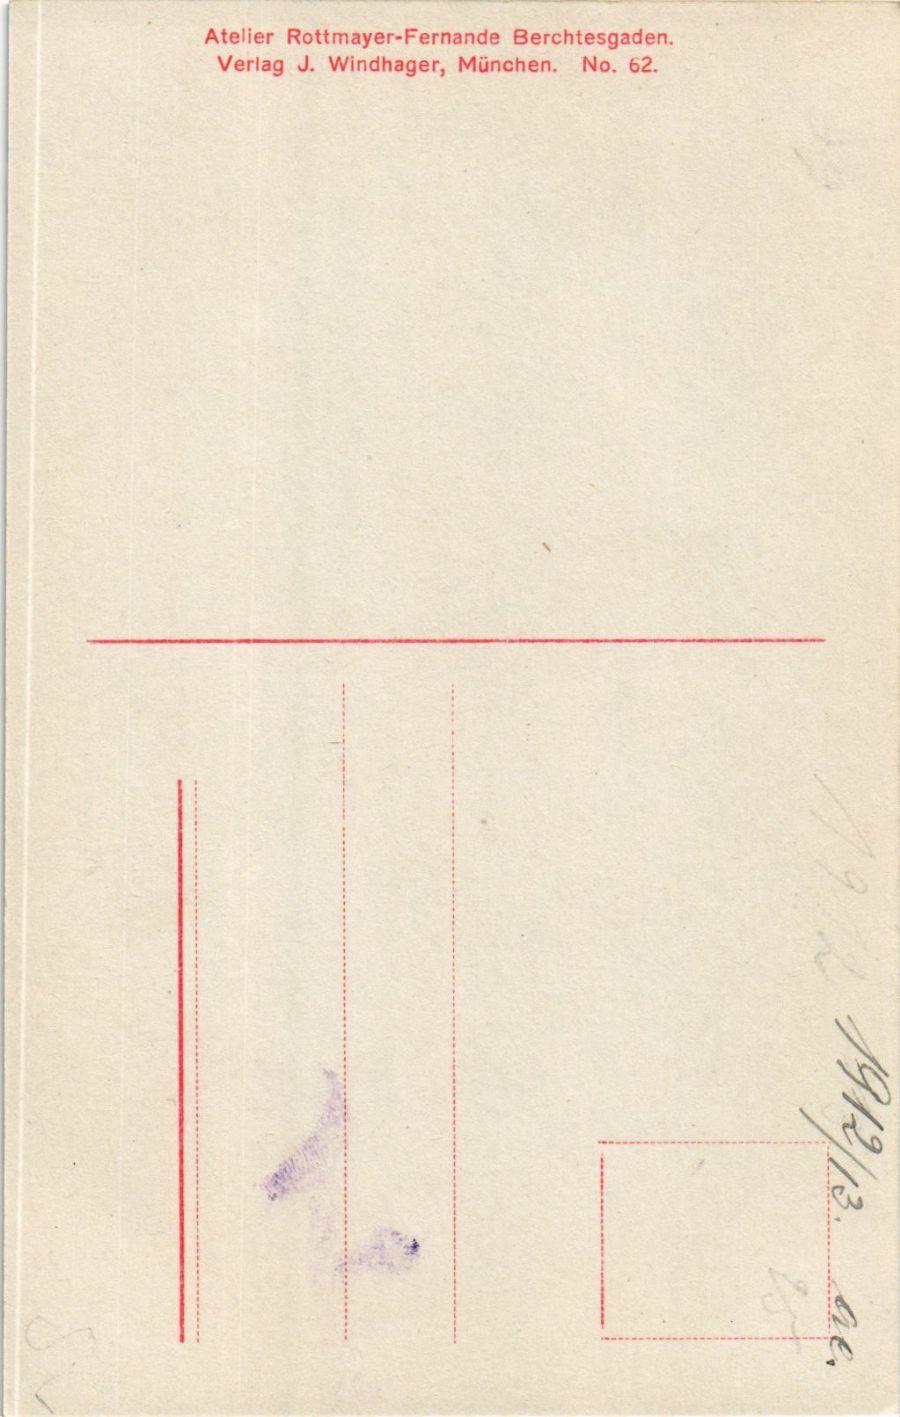 CPA-AK-Prinz-Luitpold-u-Albrecht-v-Bayern-GERMAN-ROYALTY-867353 Indexbild 2